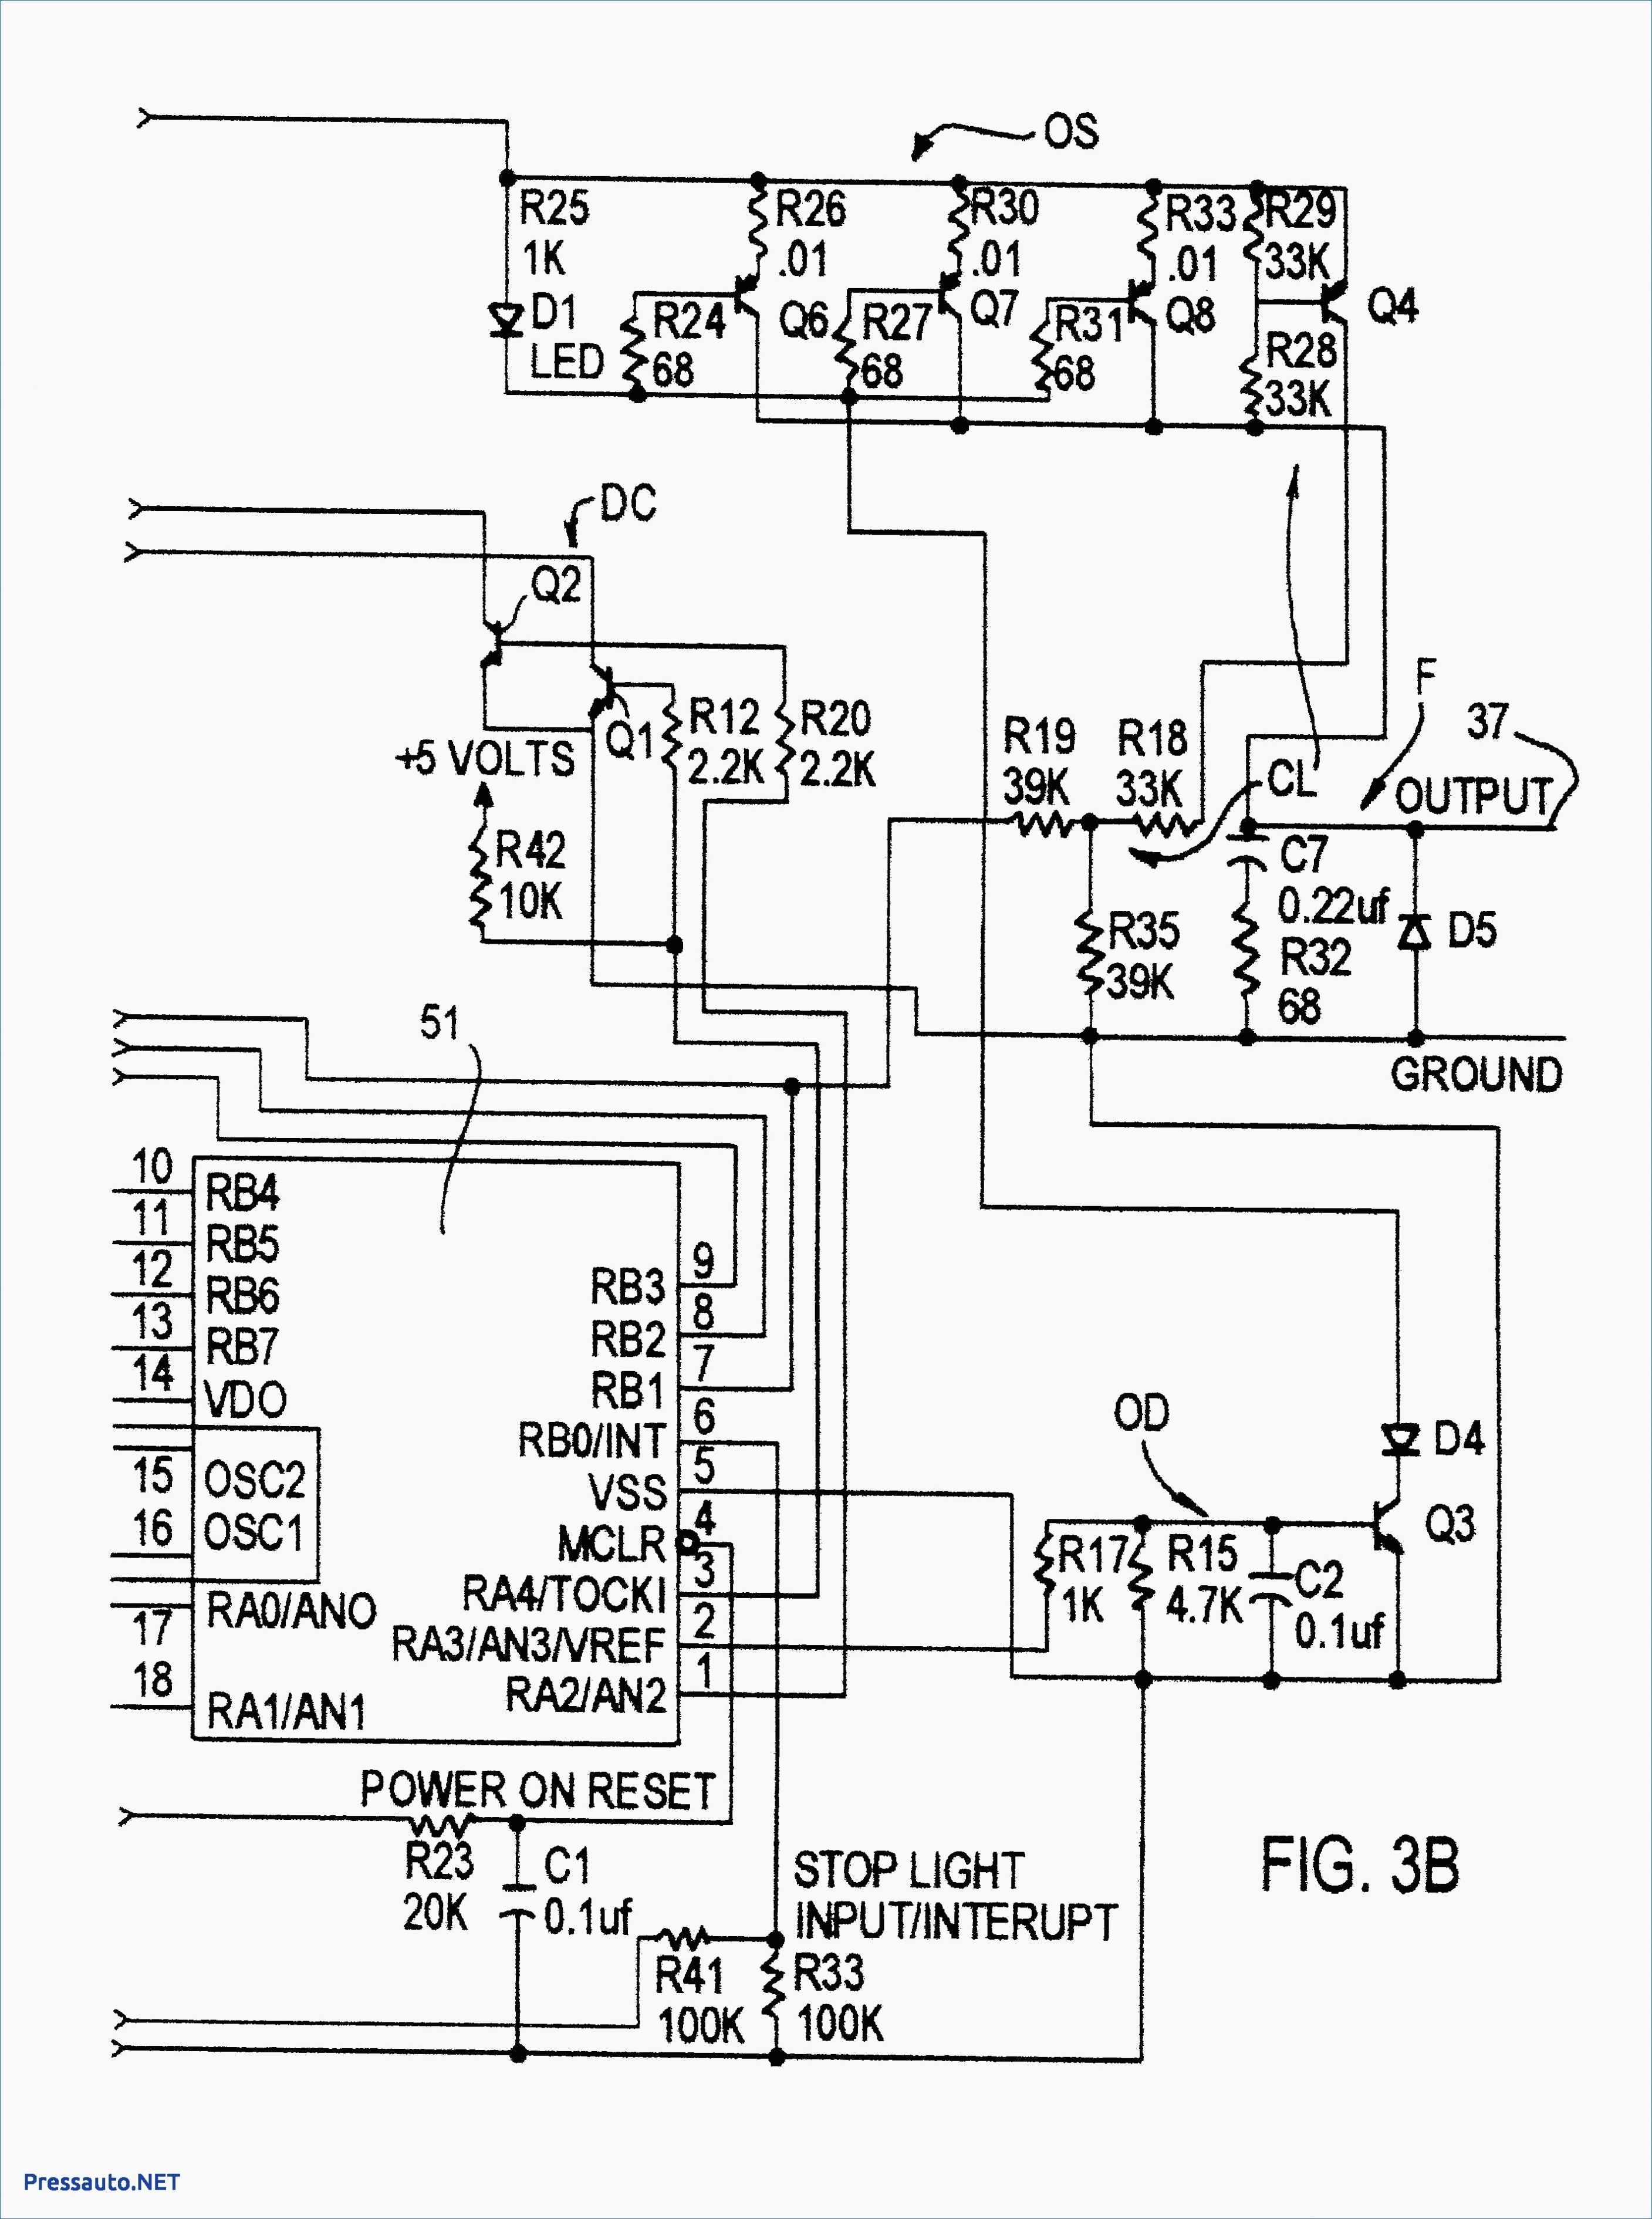 Logic Diagram Generator — Daytonva150 - Wiring Diagram Creator